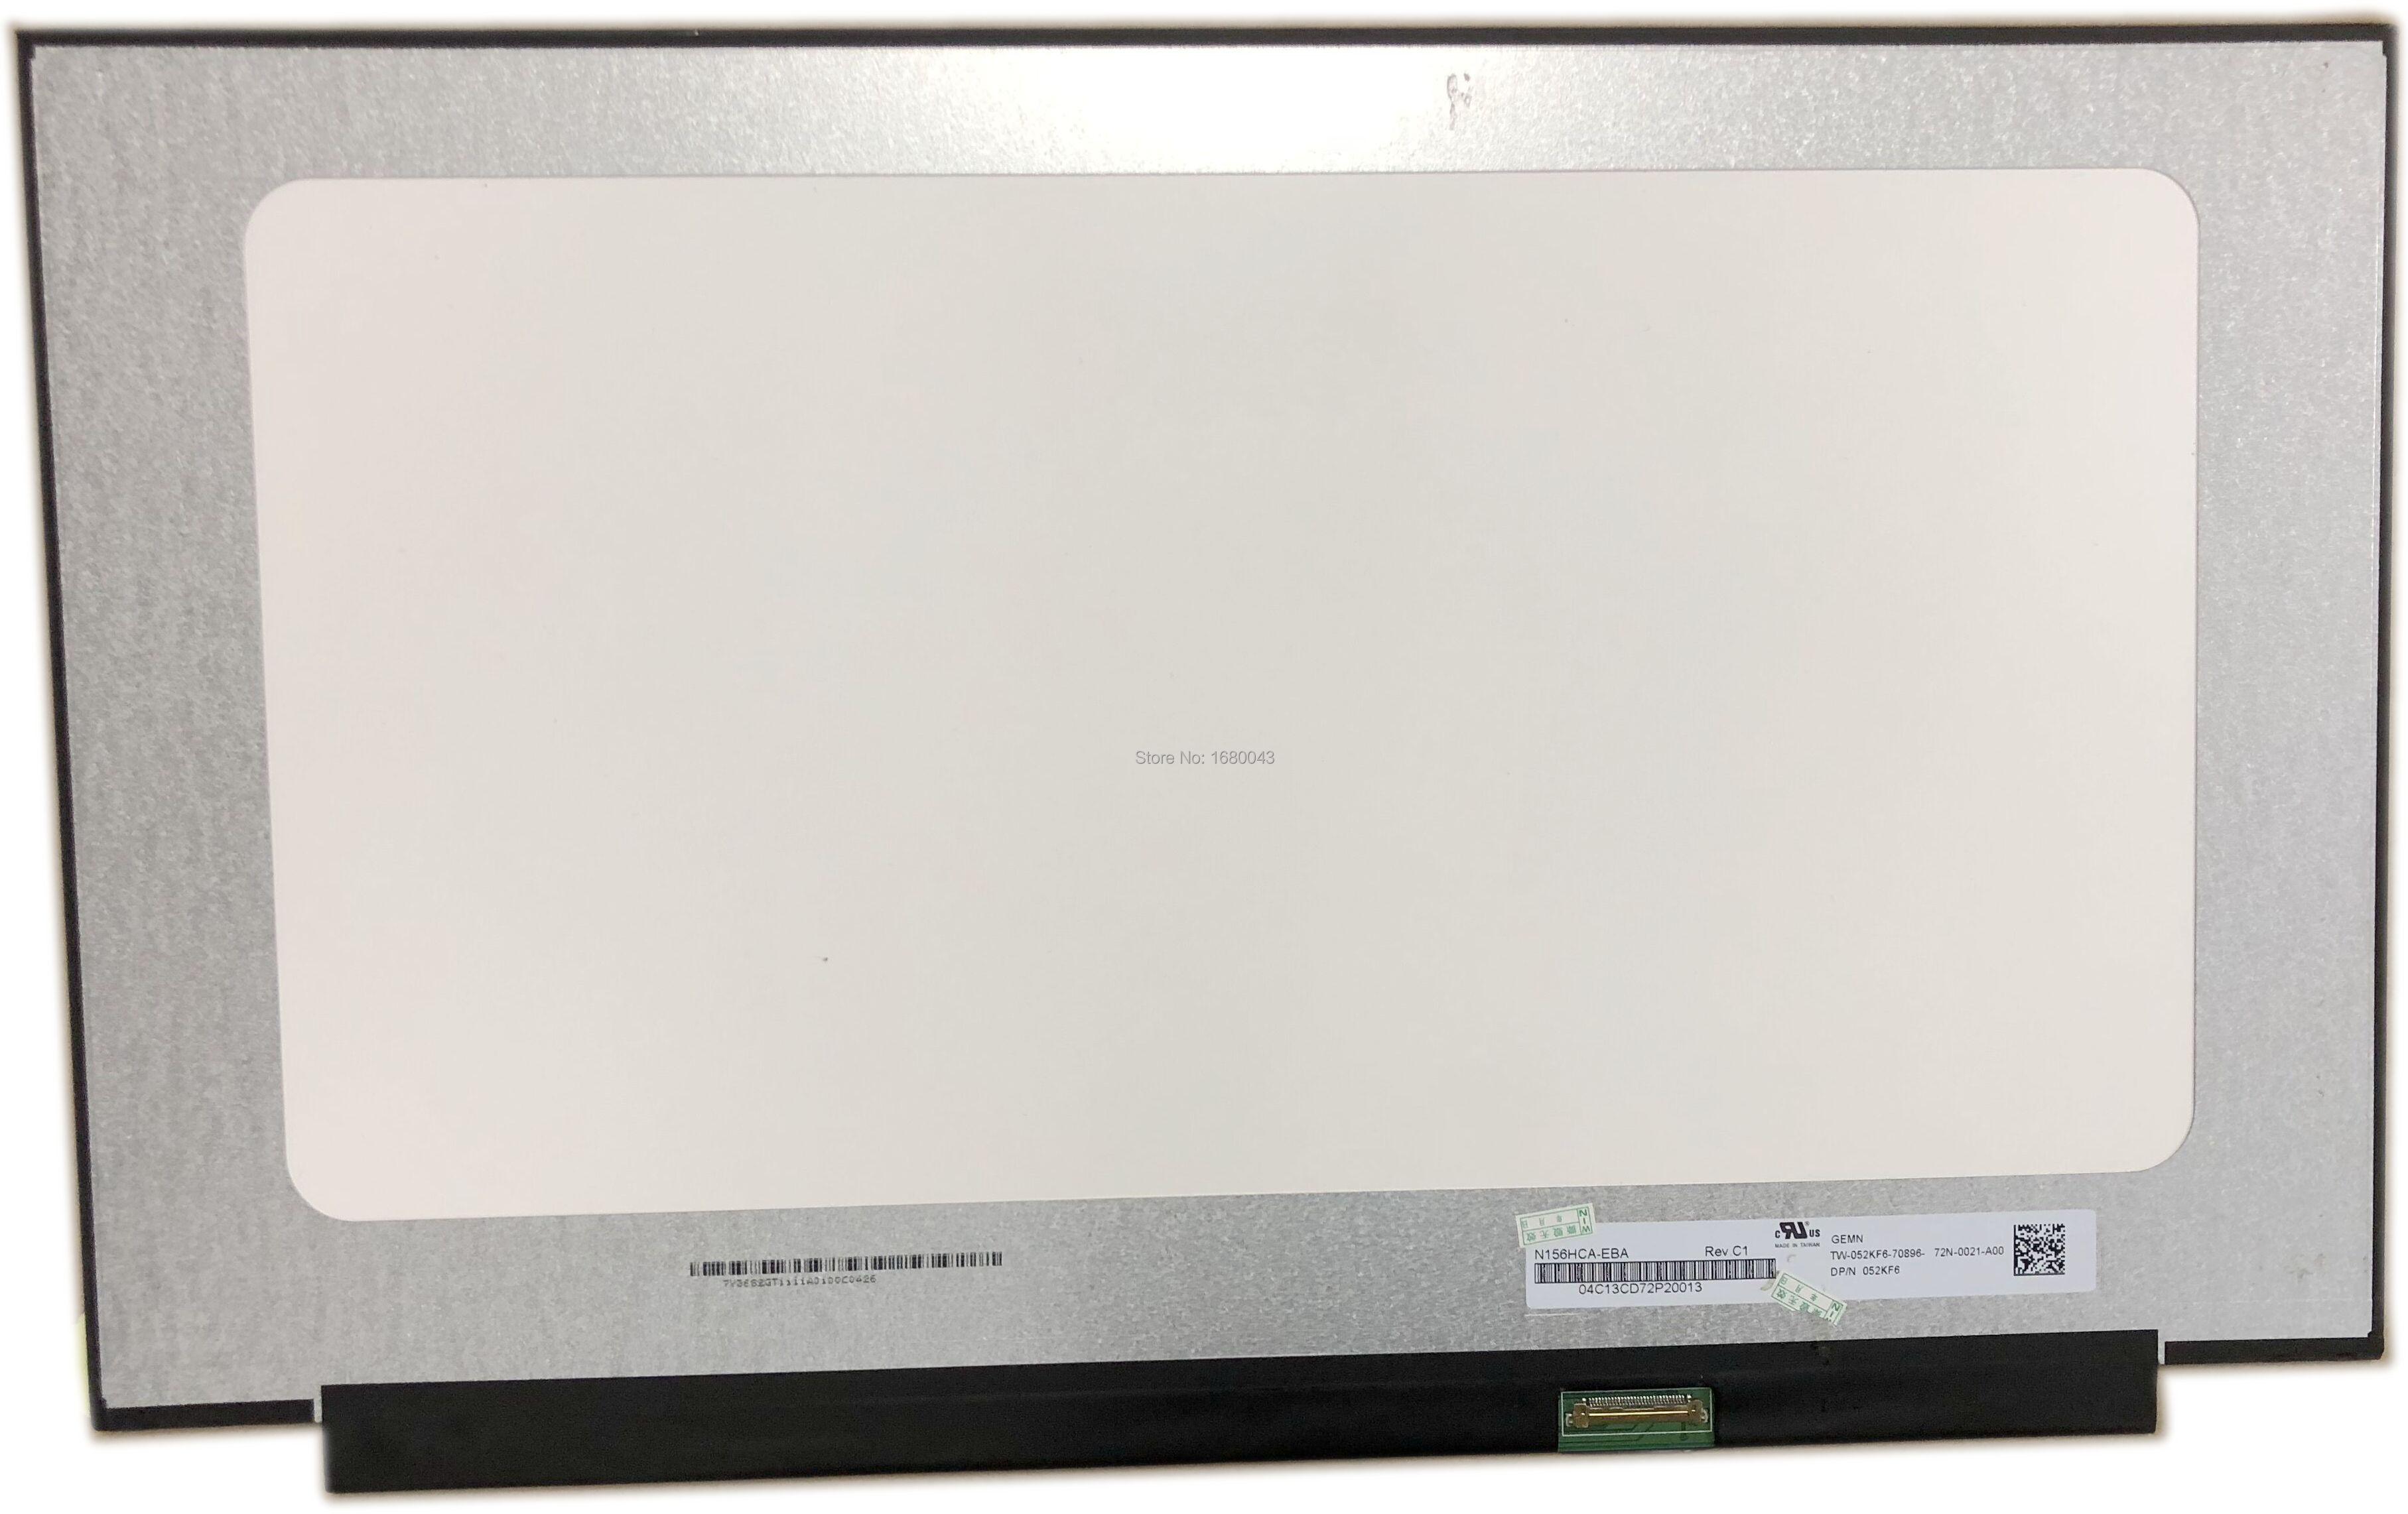 N156HCA-EBA fit NV156FHM-N35 LP156WF9 SPC1 15.6LED LCD Screen IPS 1920x1080 DisplayN156HCA-EBA fit NV156FHM-N35 LP156WF9 SPC1 15.6LED LCD Screen IPS 1920x1080 Display